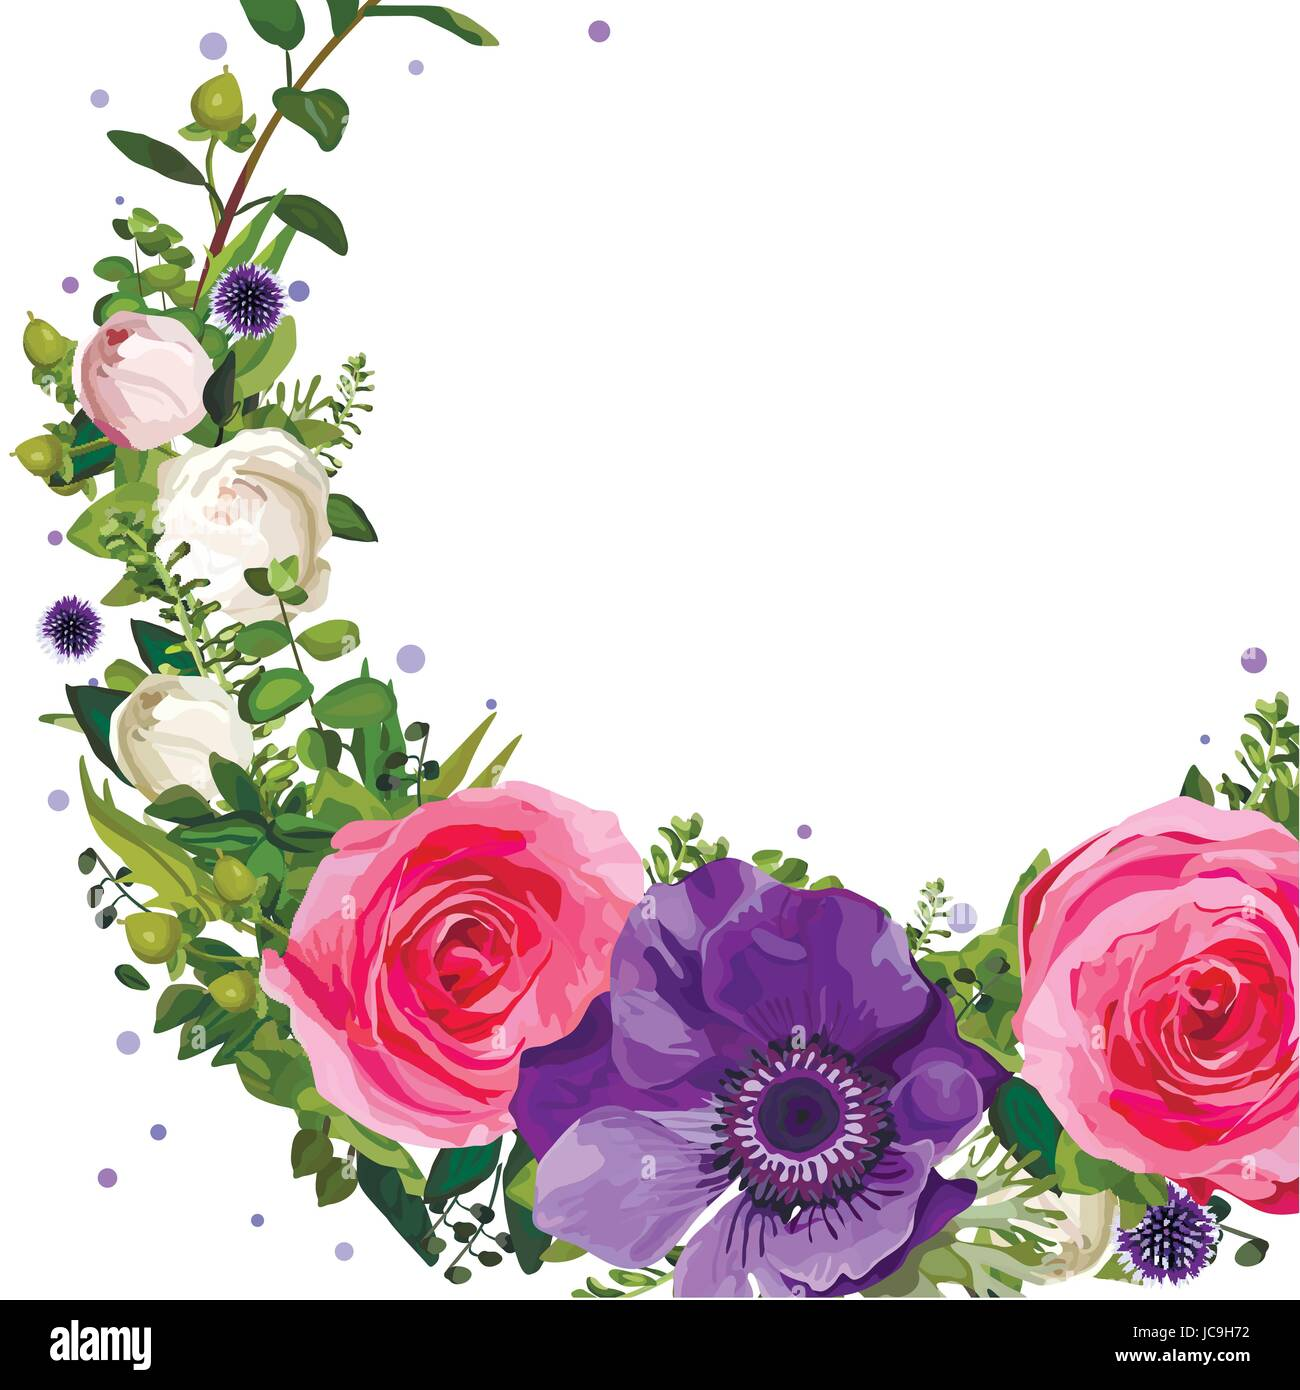 Flower wreath anemone pink rose thistle leaves beautiful lovely flower wreath anemone pink rose thistle leaves beautiful lovely spring summer bouquet vector illustration top view square elegant watercolor design gr izmirmasajfo